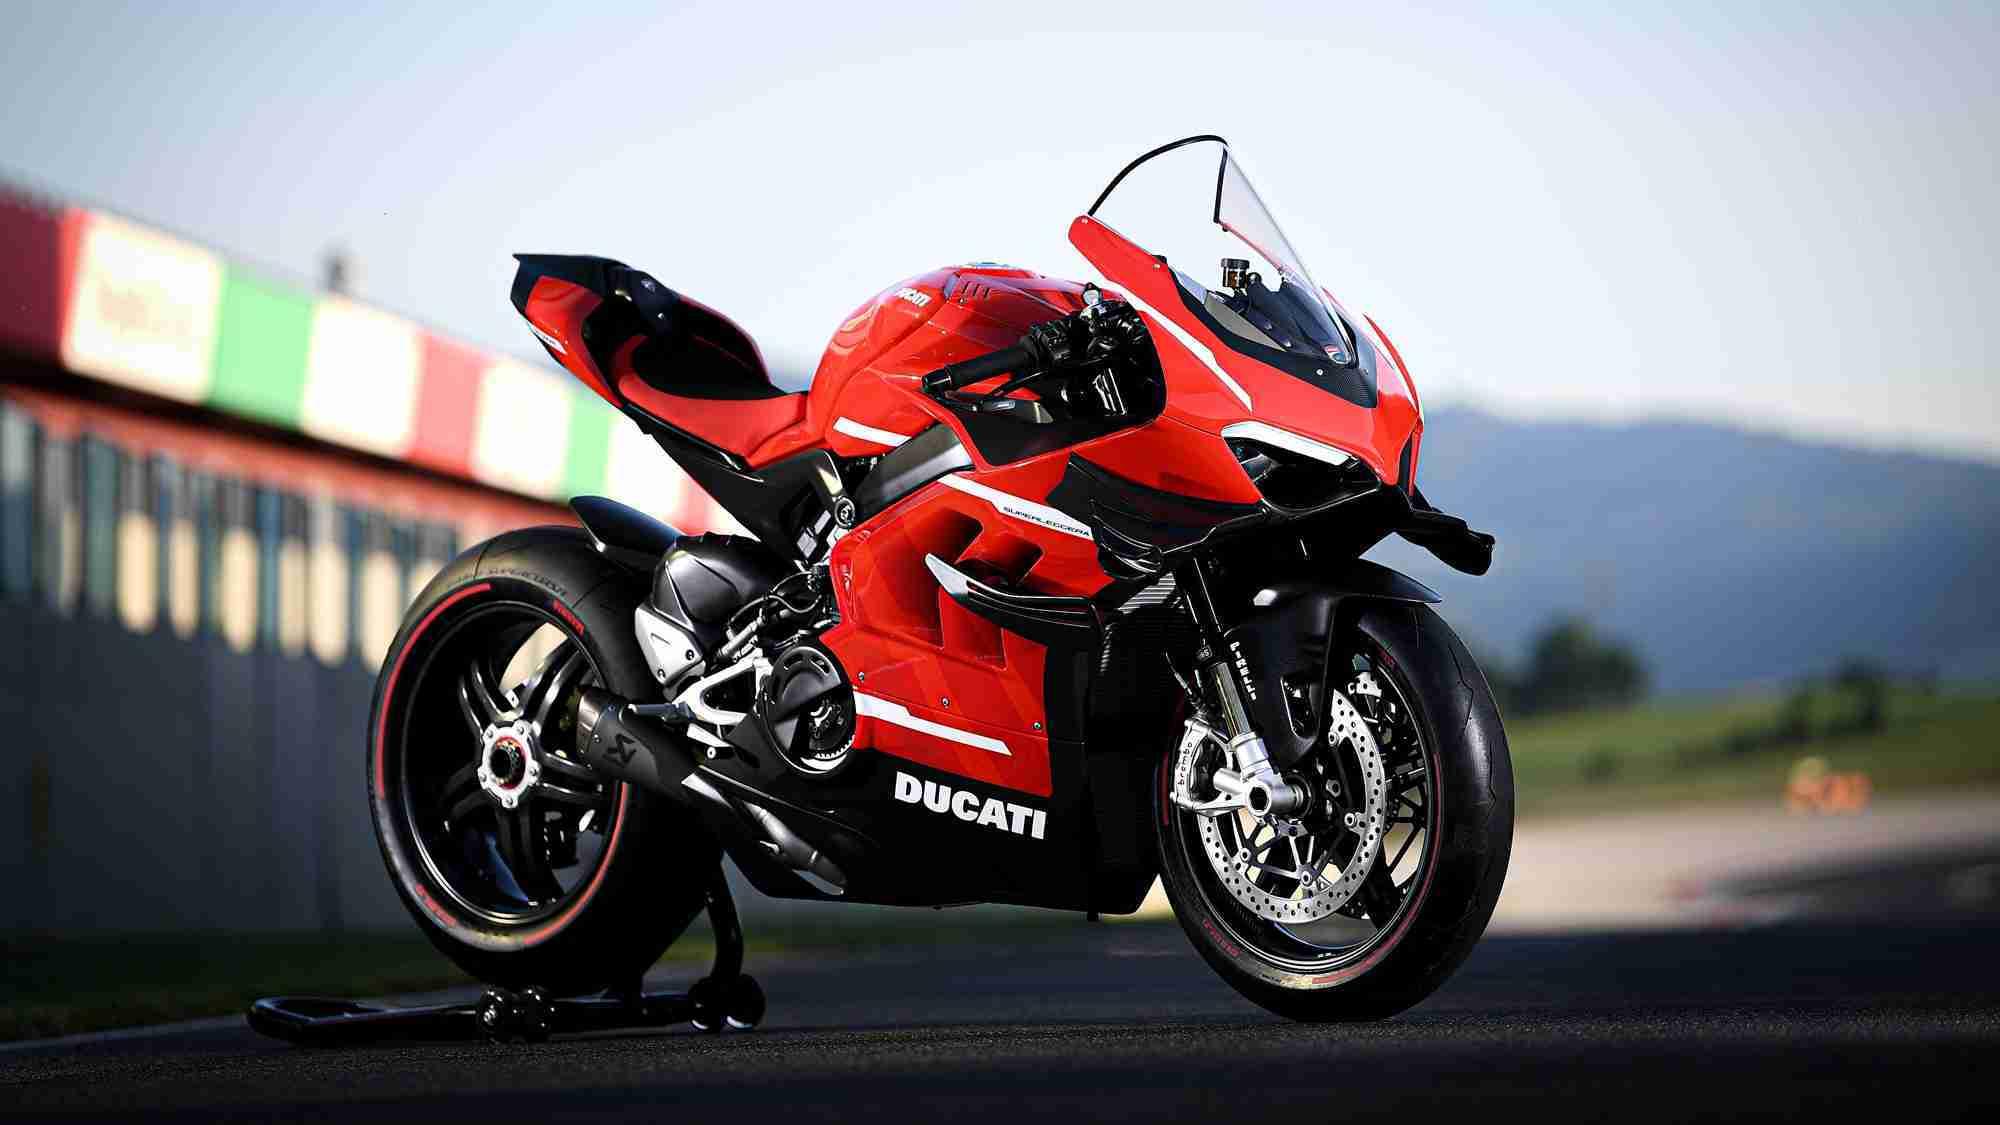 Ducati Superleggera V4 HD wallpaper